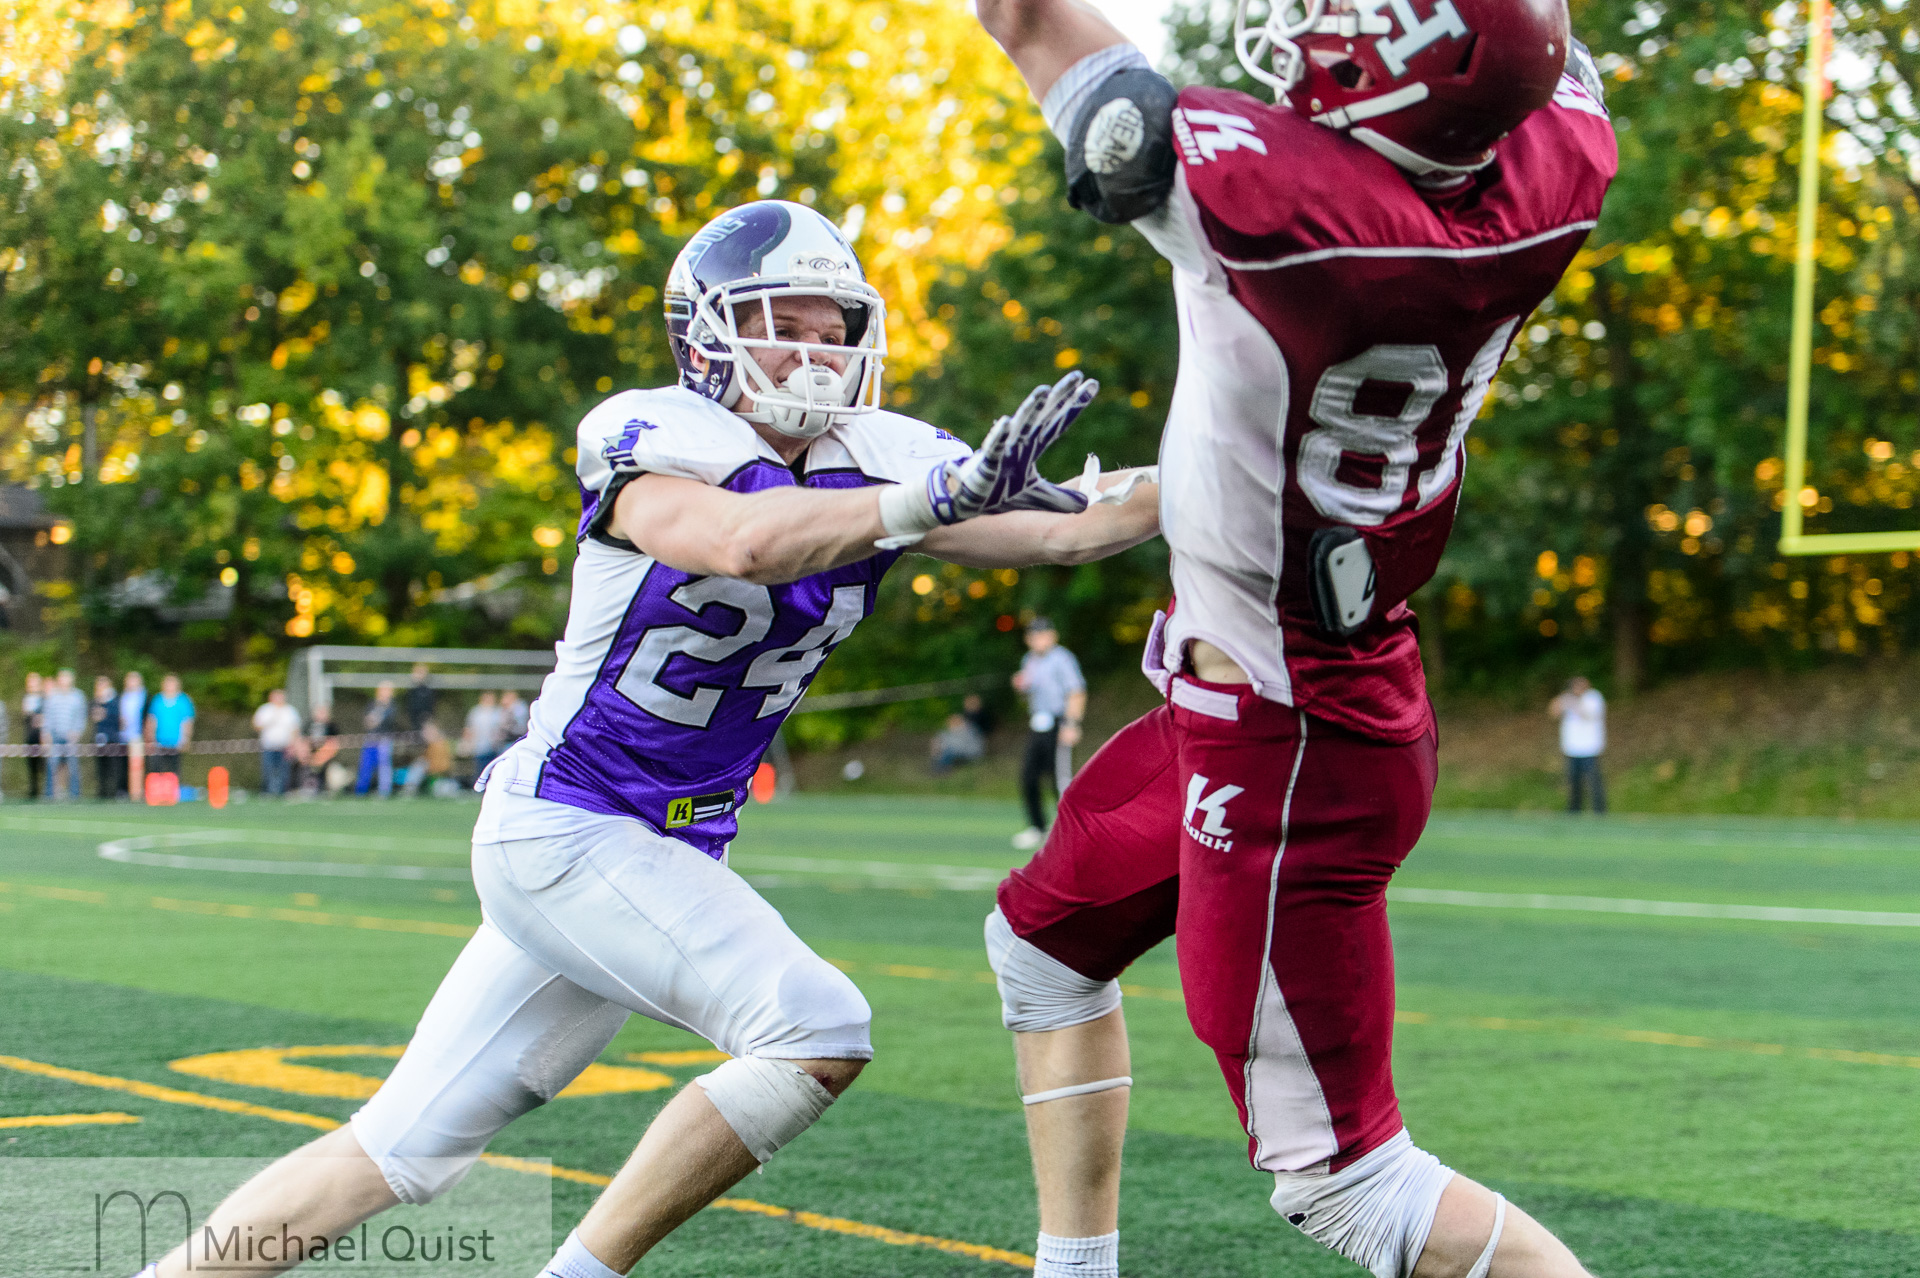 Junior-Bowl-2015-Copenhagen-Towers-vs-Herlev-Rebels-97